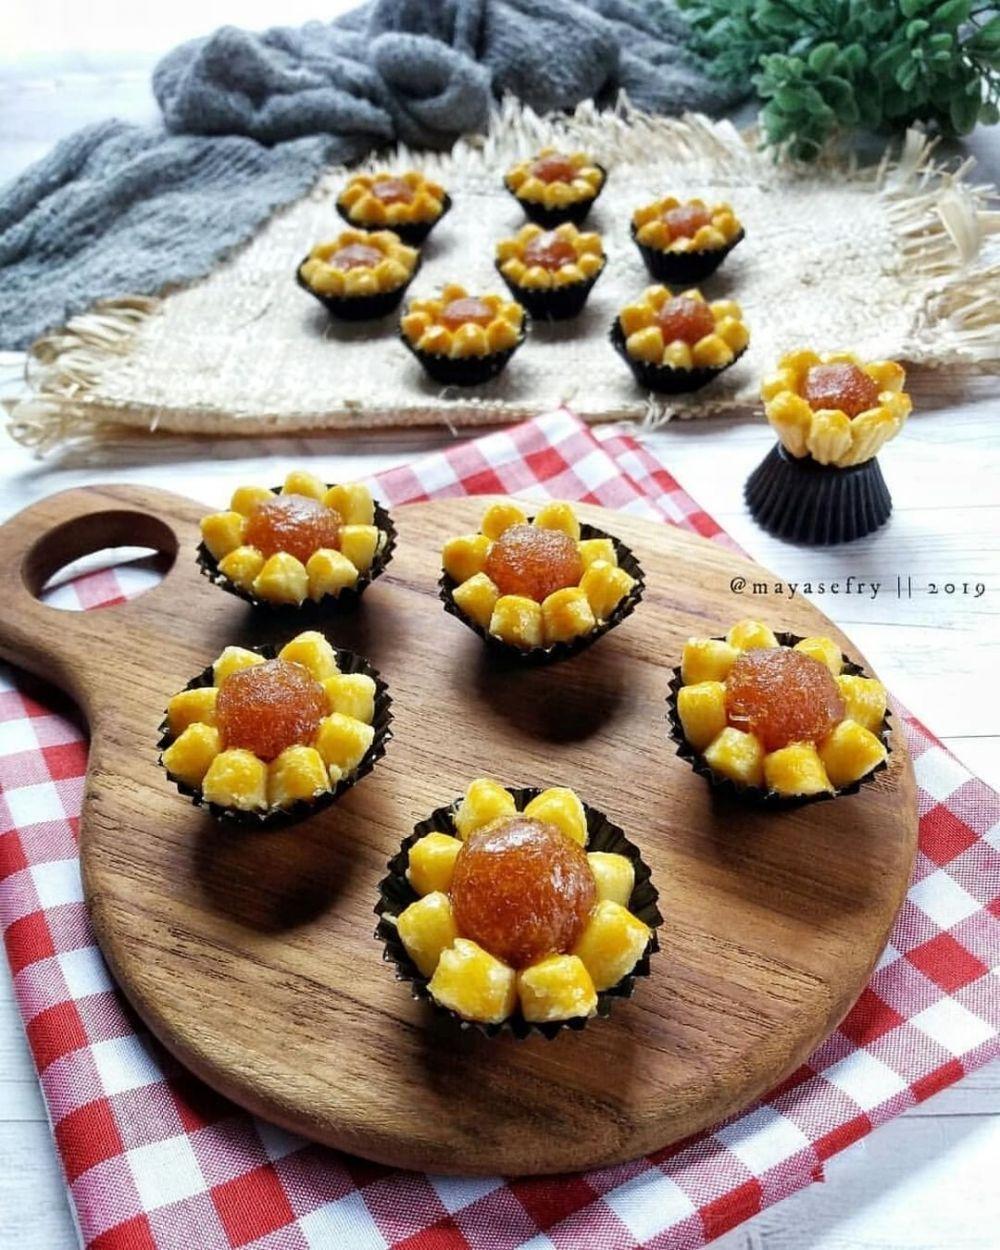 Resep Nastar Kekinian Istimewa Makanan Manis Resep Biskuit Nastar